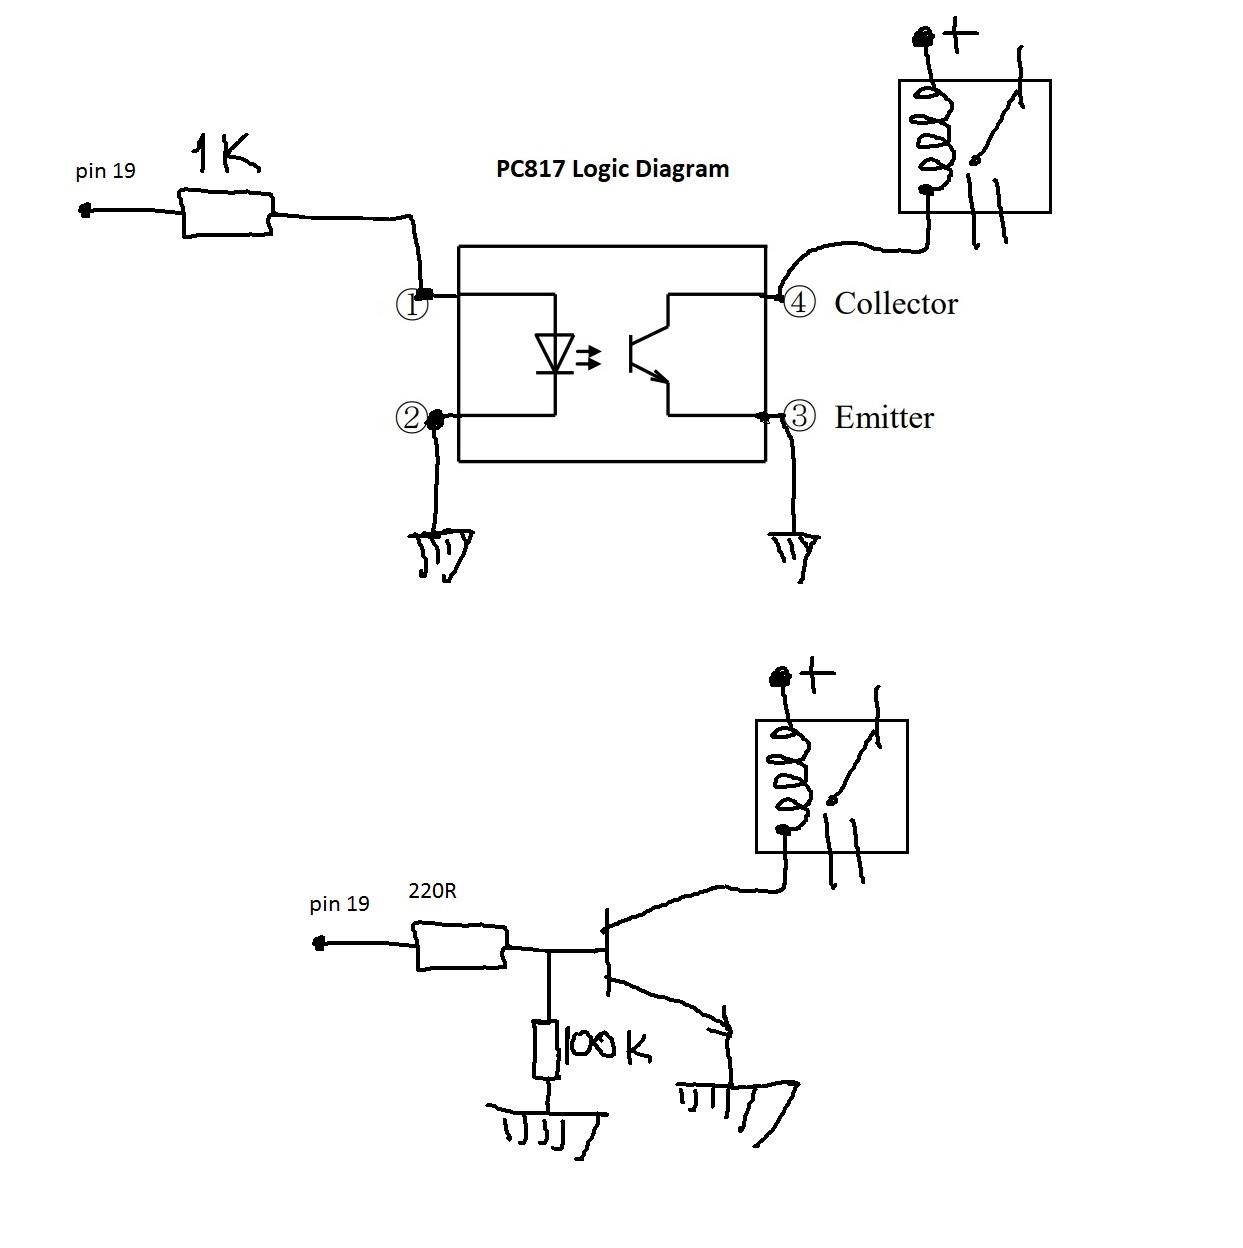 PC817-Logic-Diagram — imgbb.com